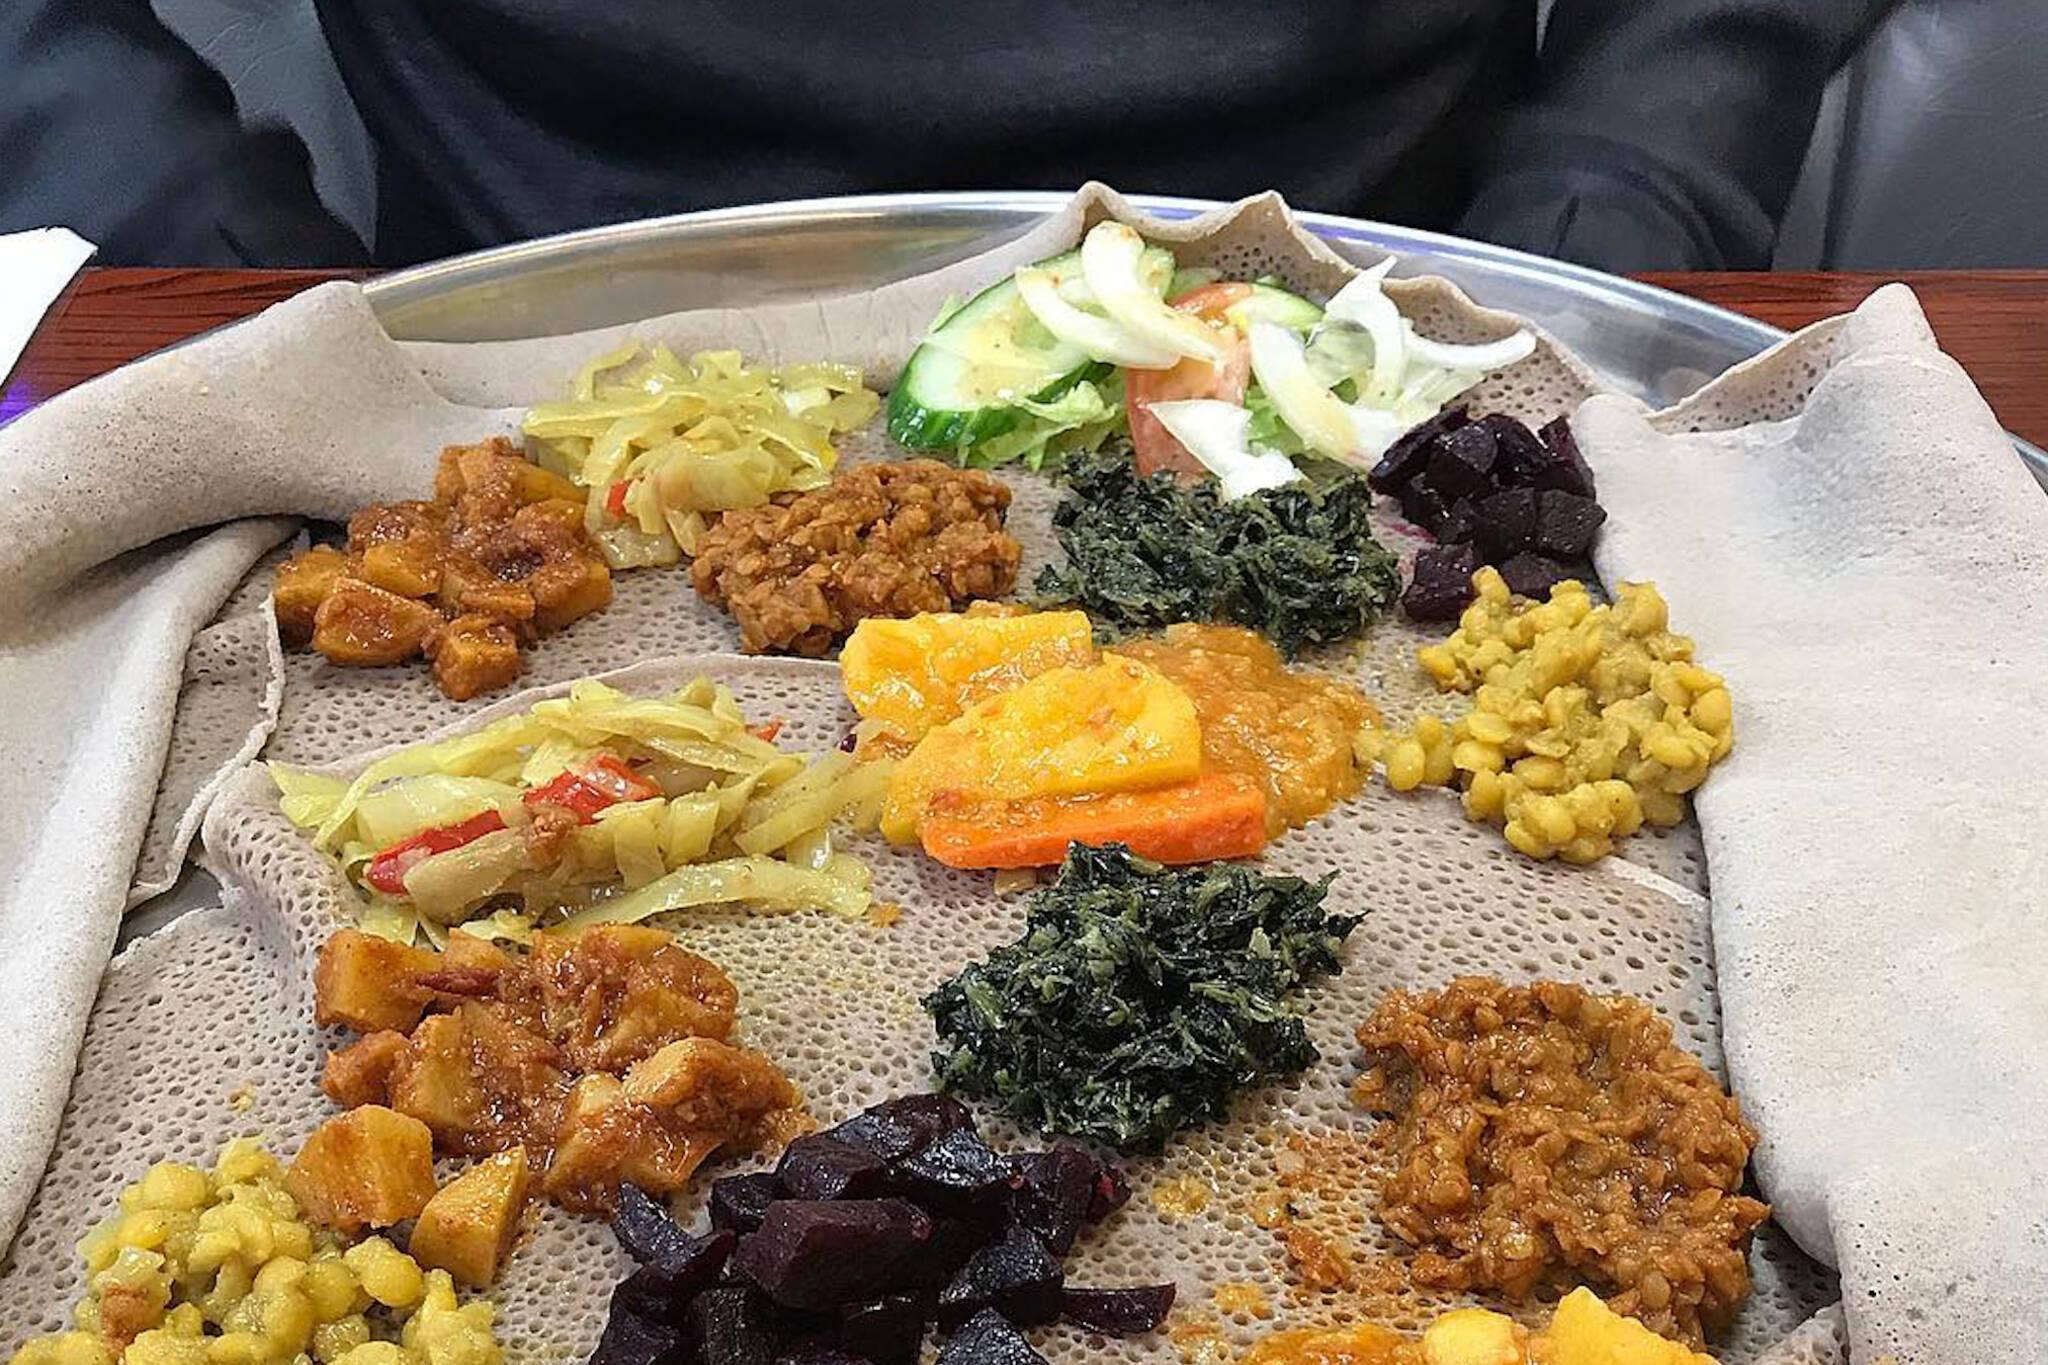 Toronto Ethiopian restaurant shut down by health inspectors